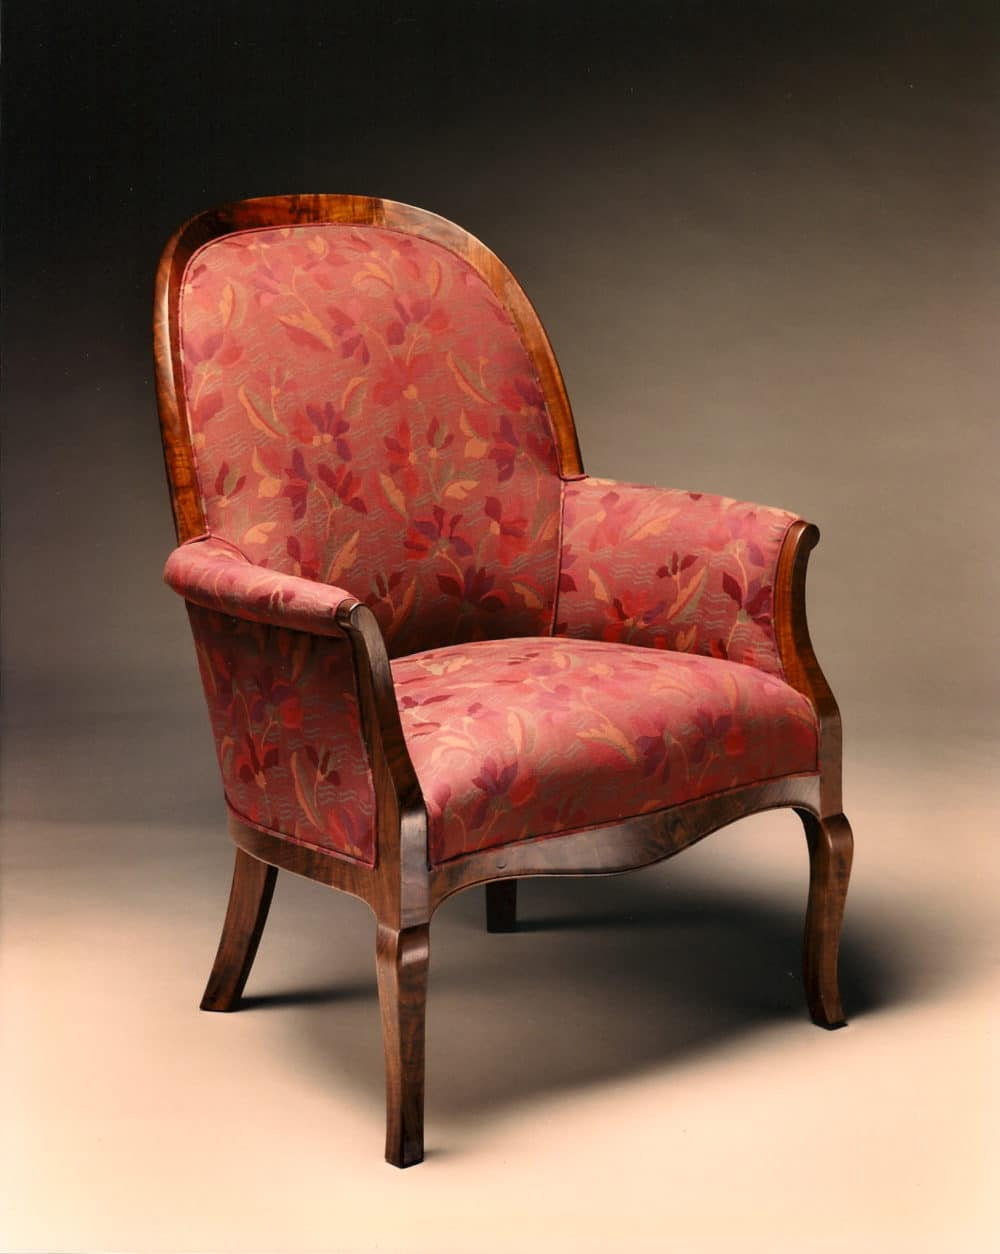 Gregory Hay Designs Bergere Chair in Claro Walnut